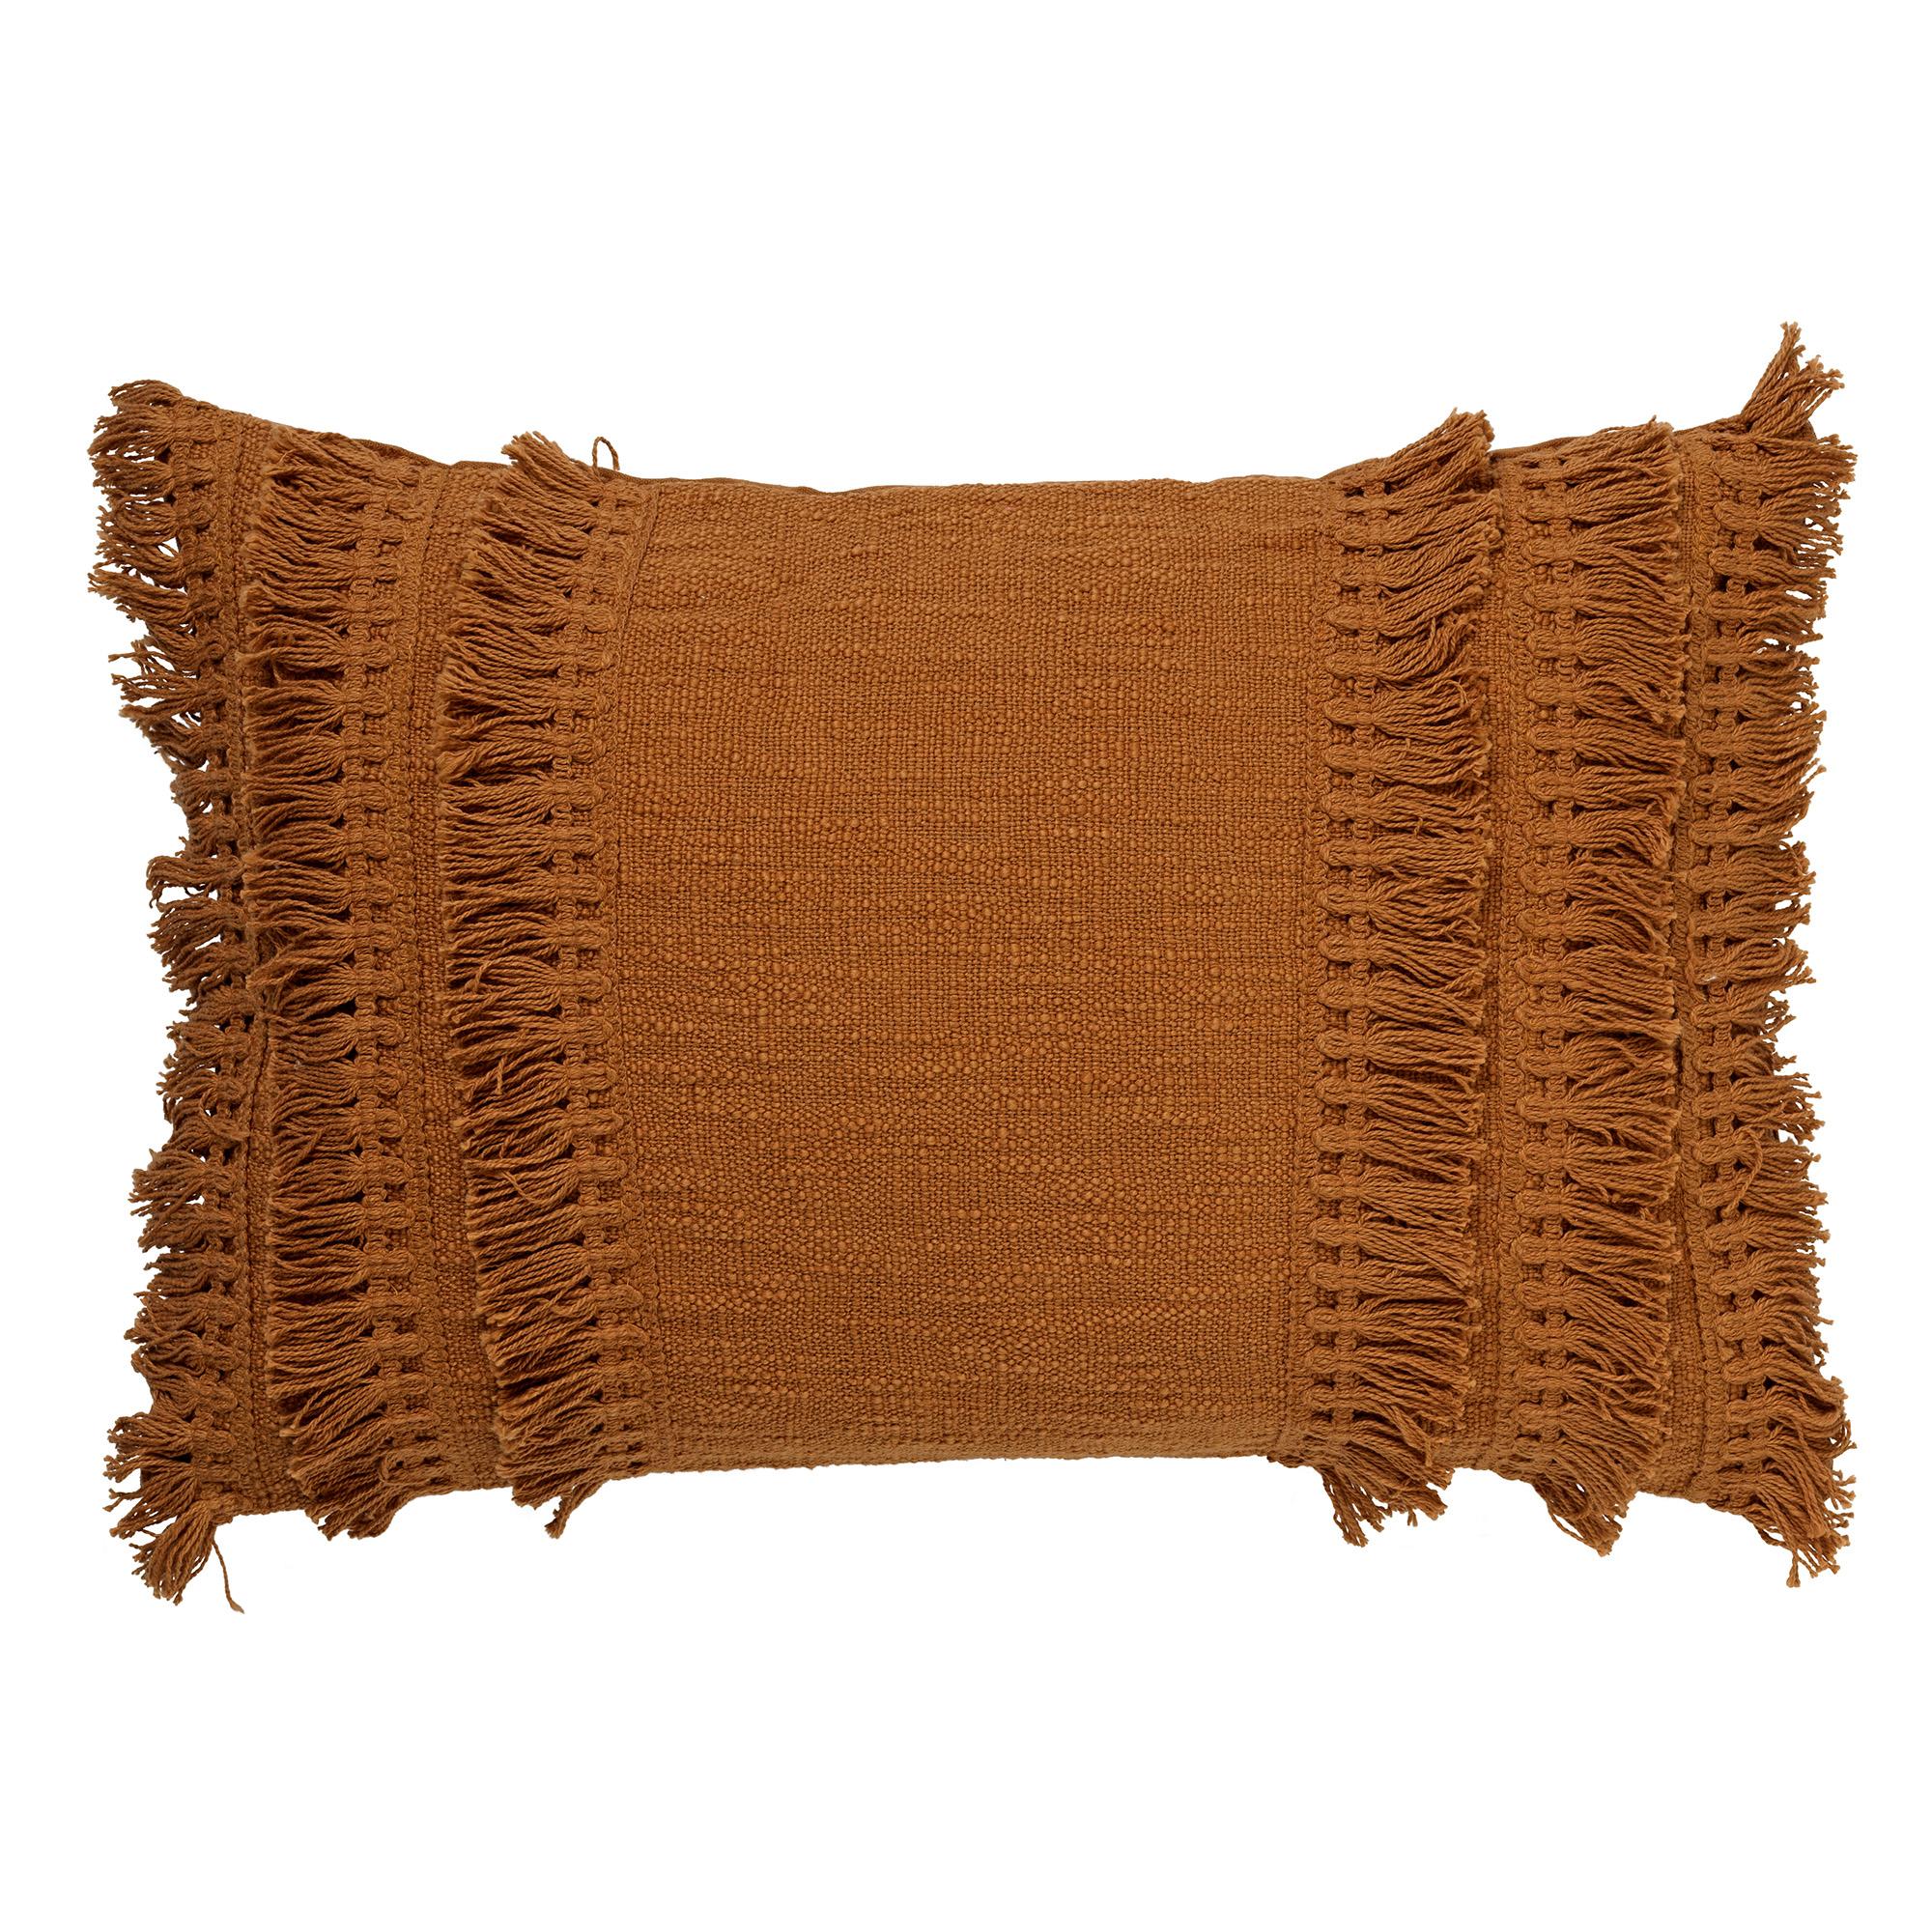 FARA - Sierkussen van katoen Tobacco Brown 40x60 cm